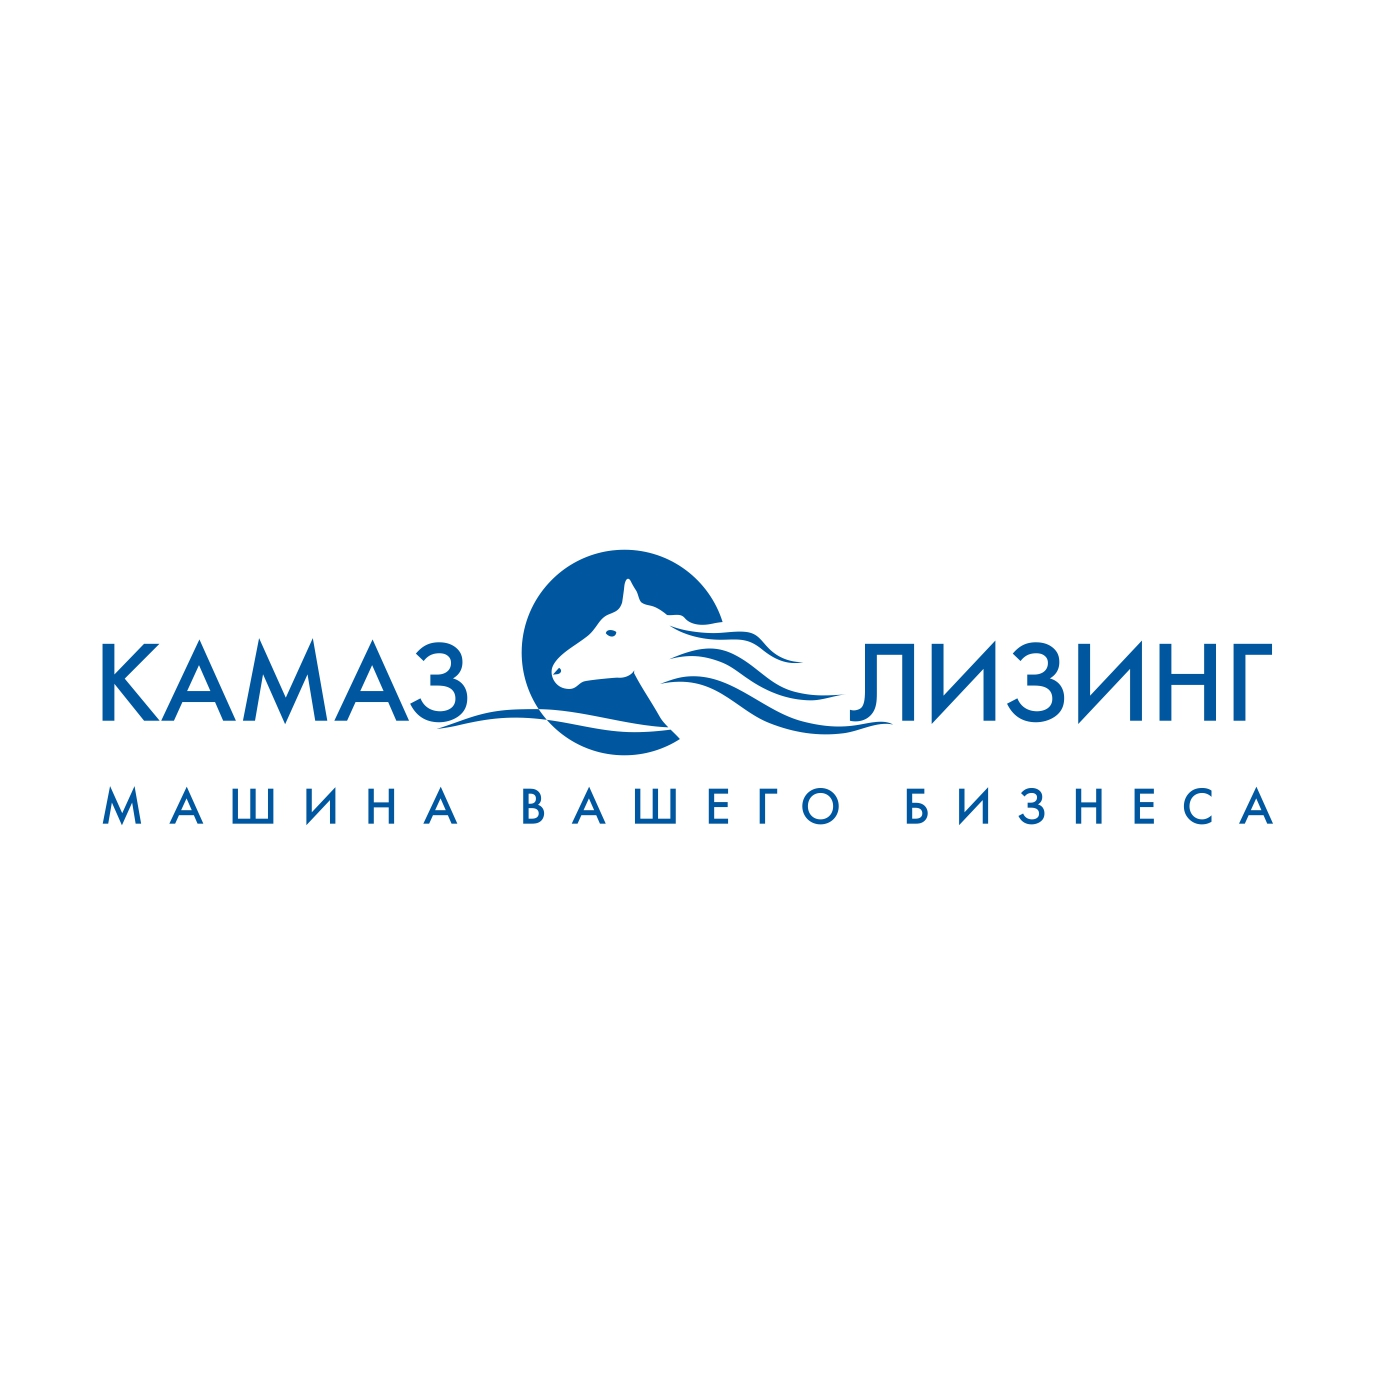 У офиса «КАМАЗ-ЛИЗИНГа» - новый адрес